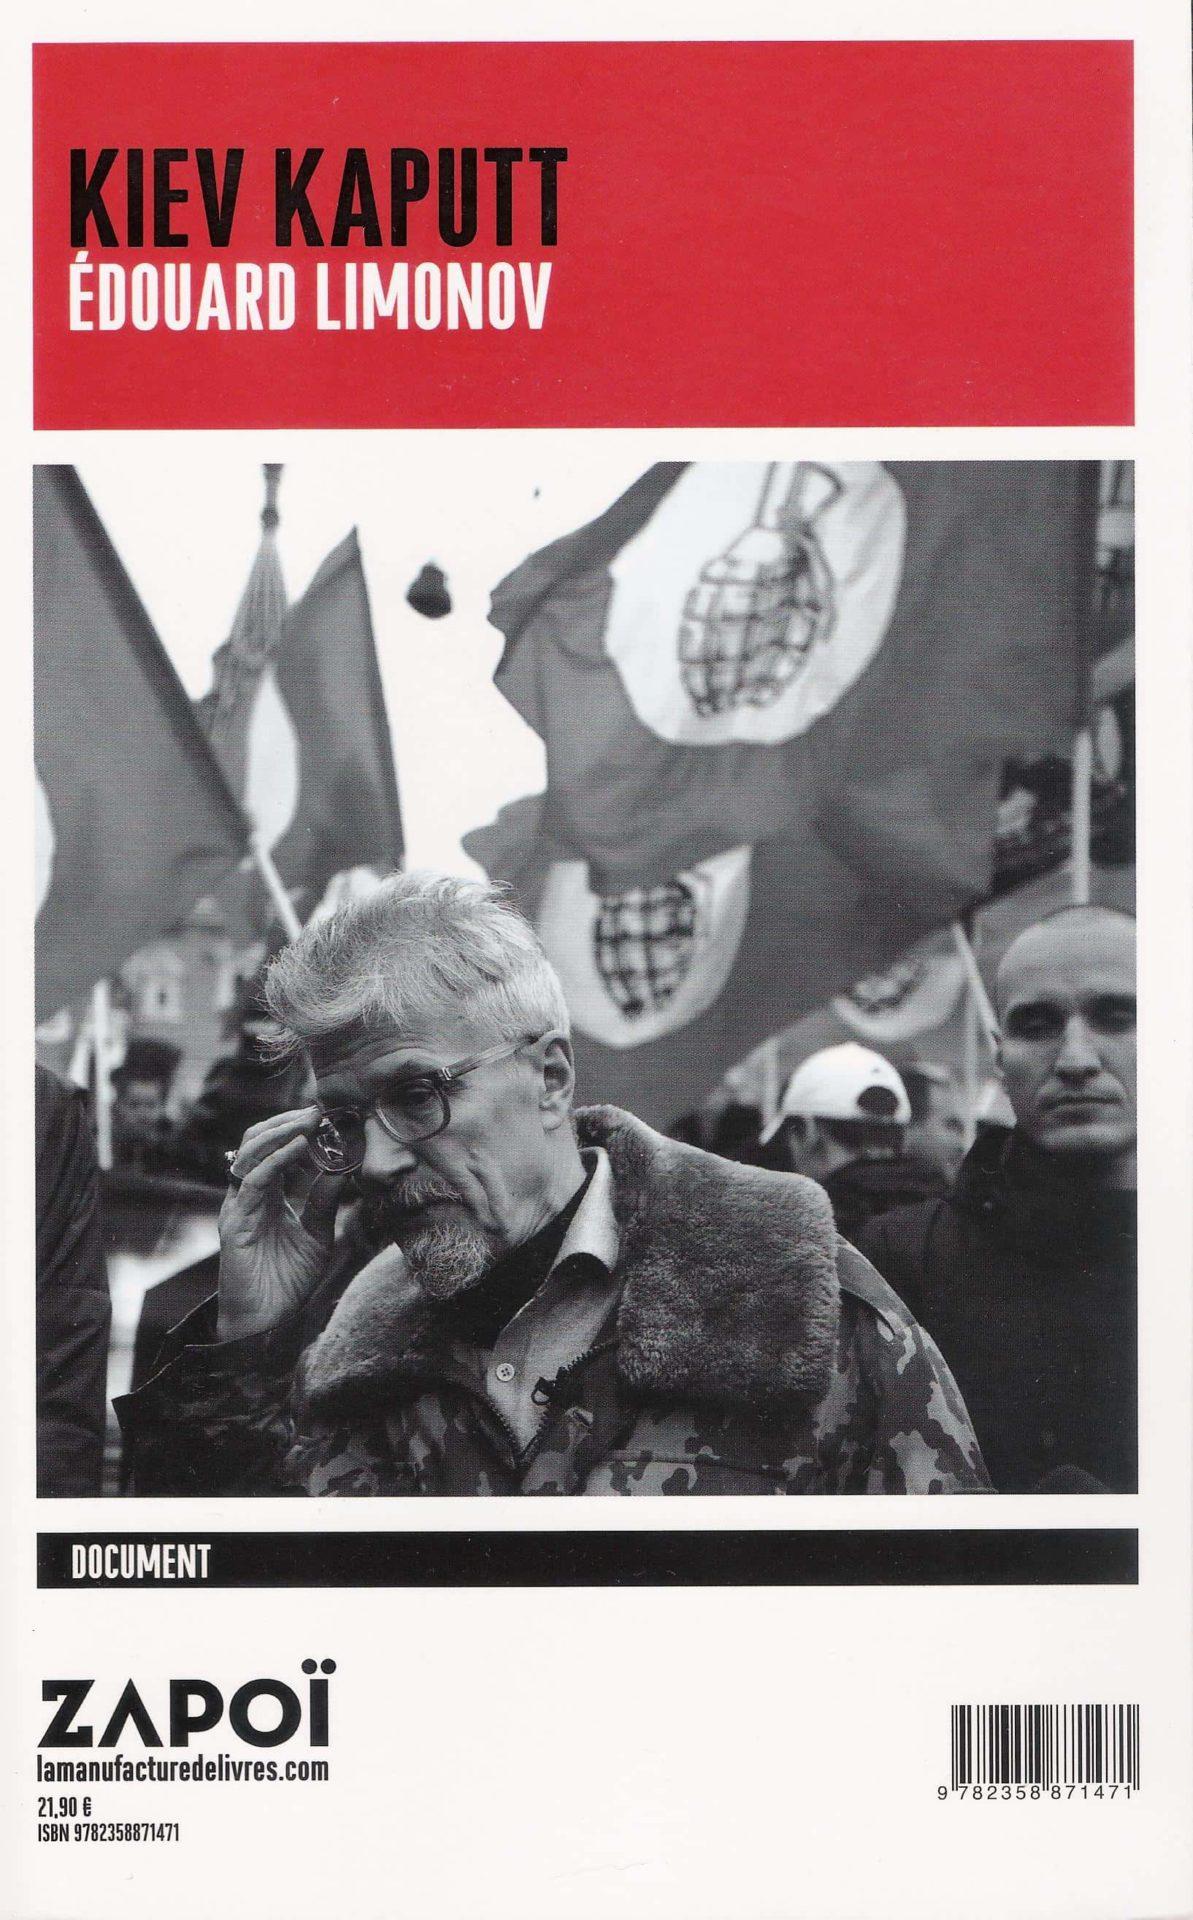 Kiev kaputt, Edward Limonov, La Manufacture, 2017, 319 p., 21,90 €).